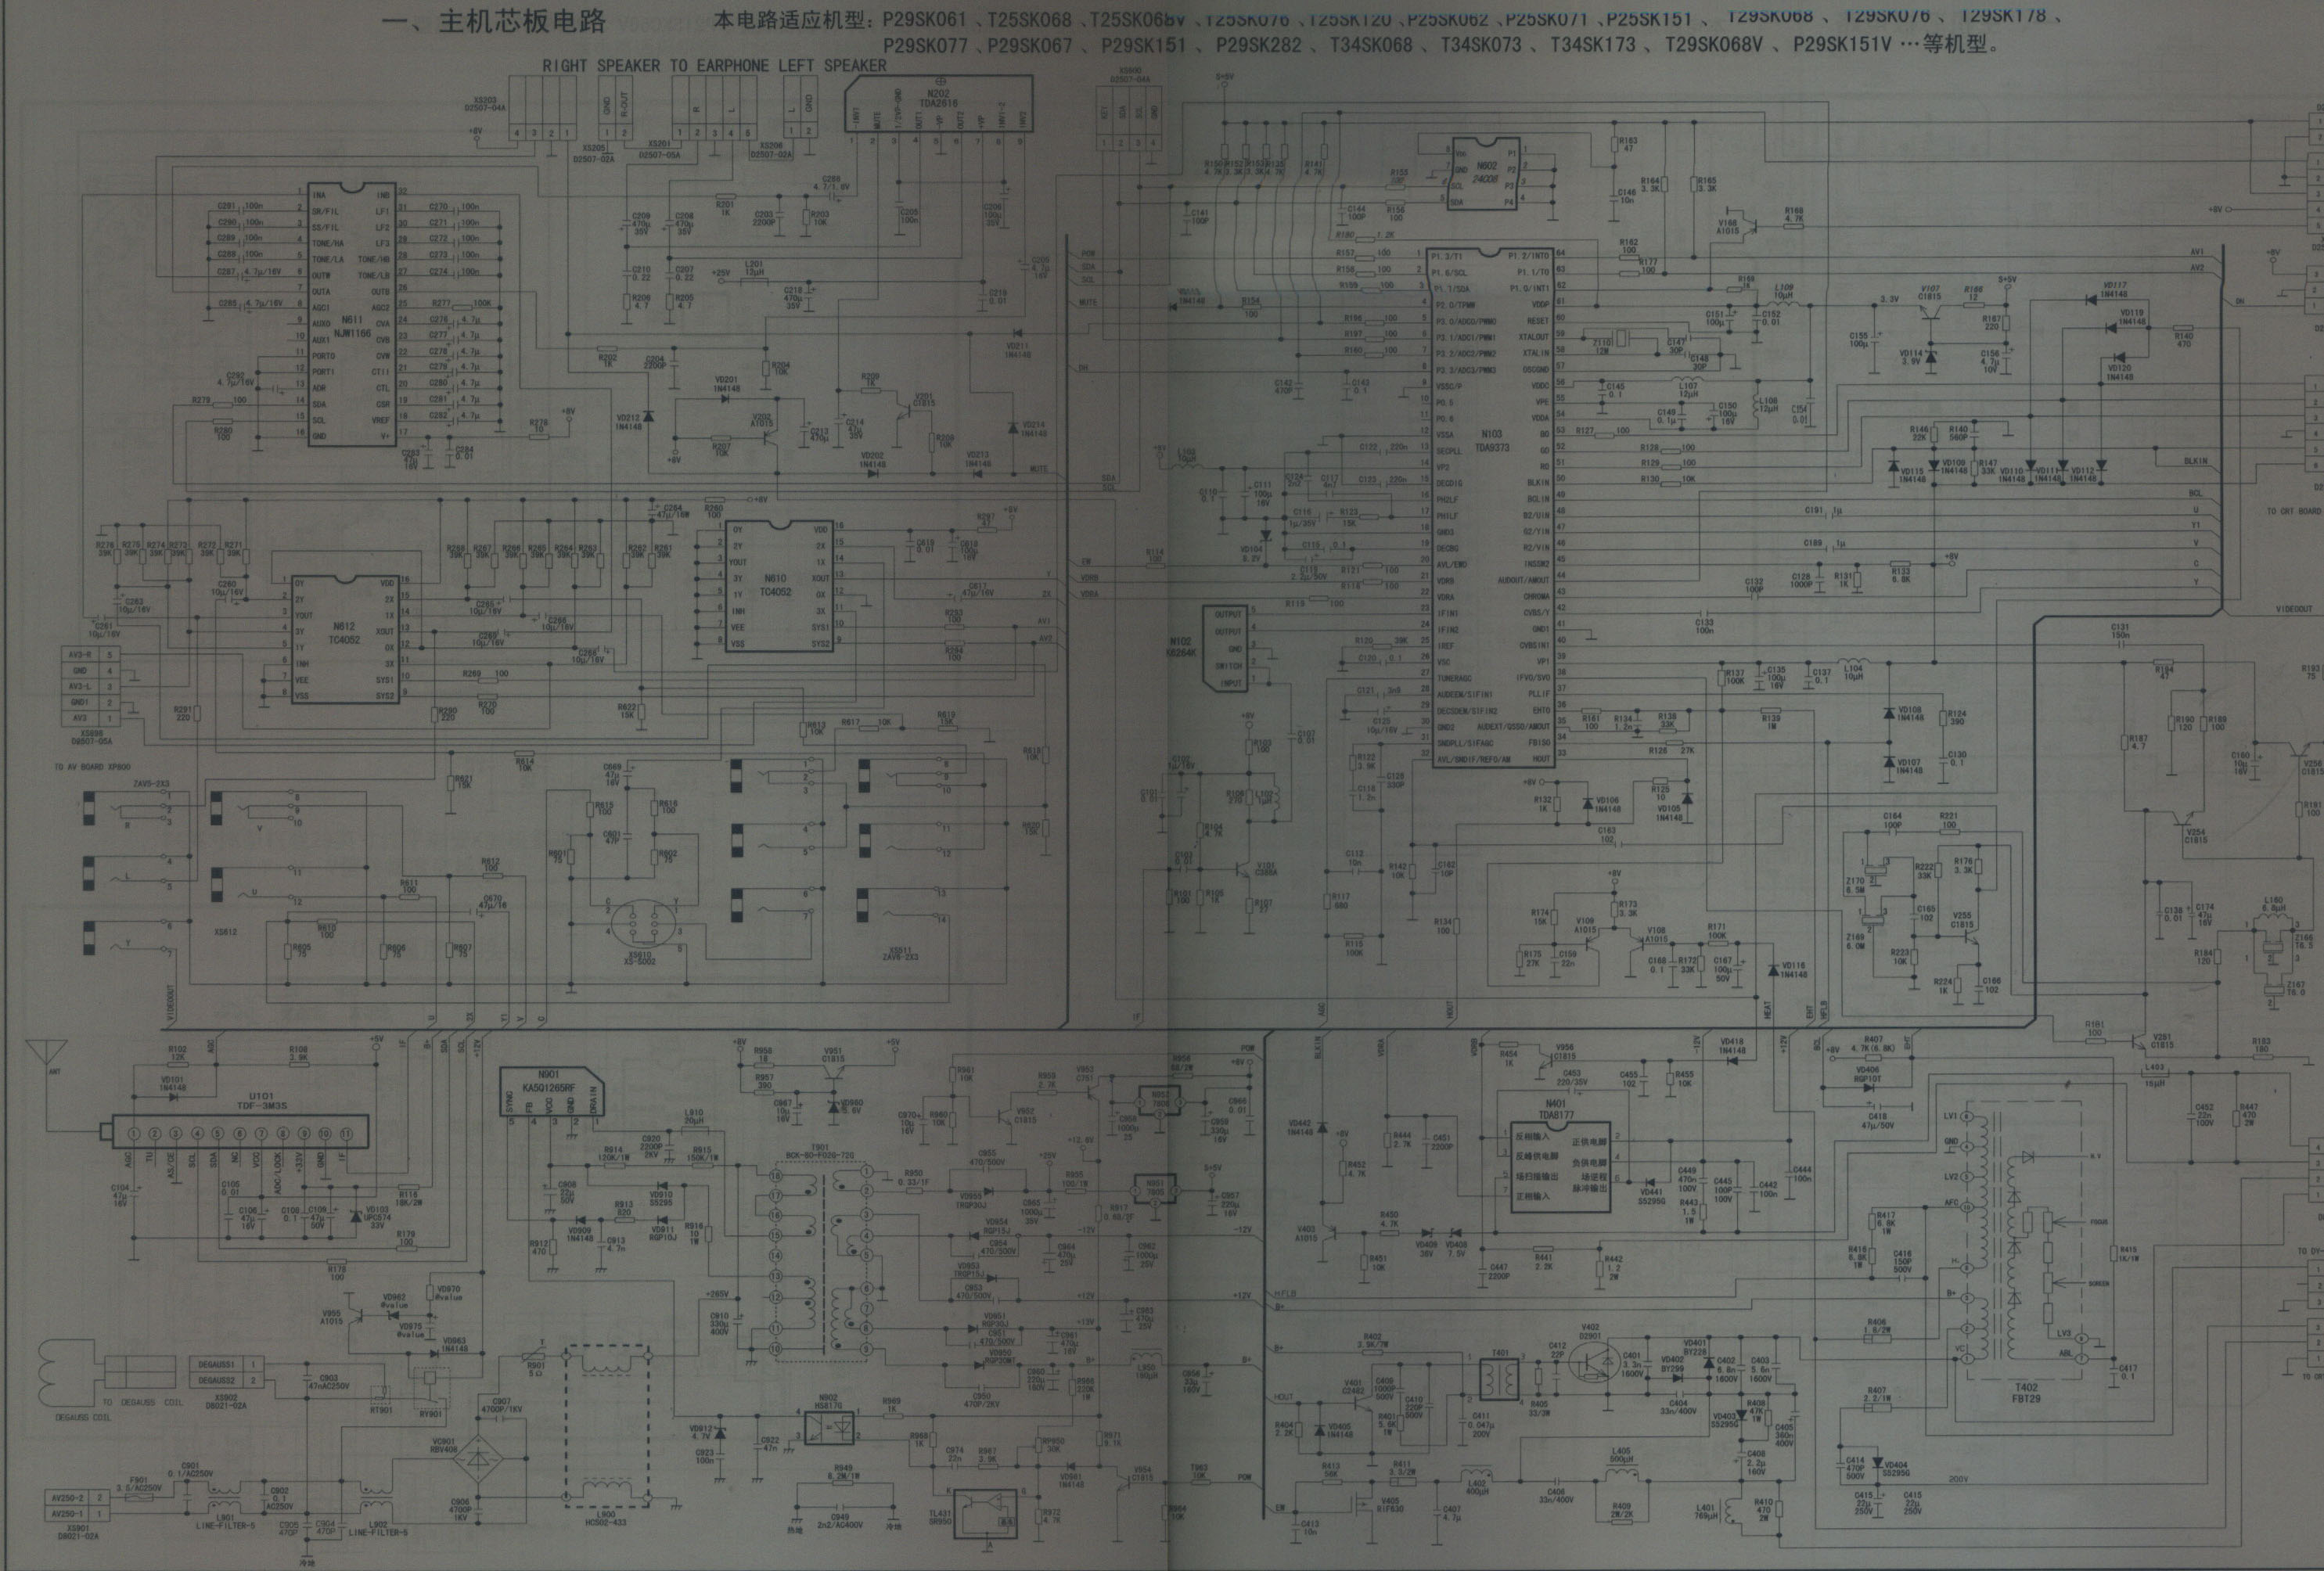 谁有康佳t25sk026的电路图